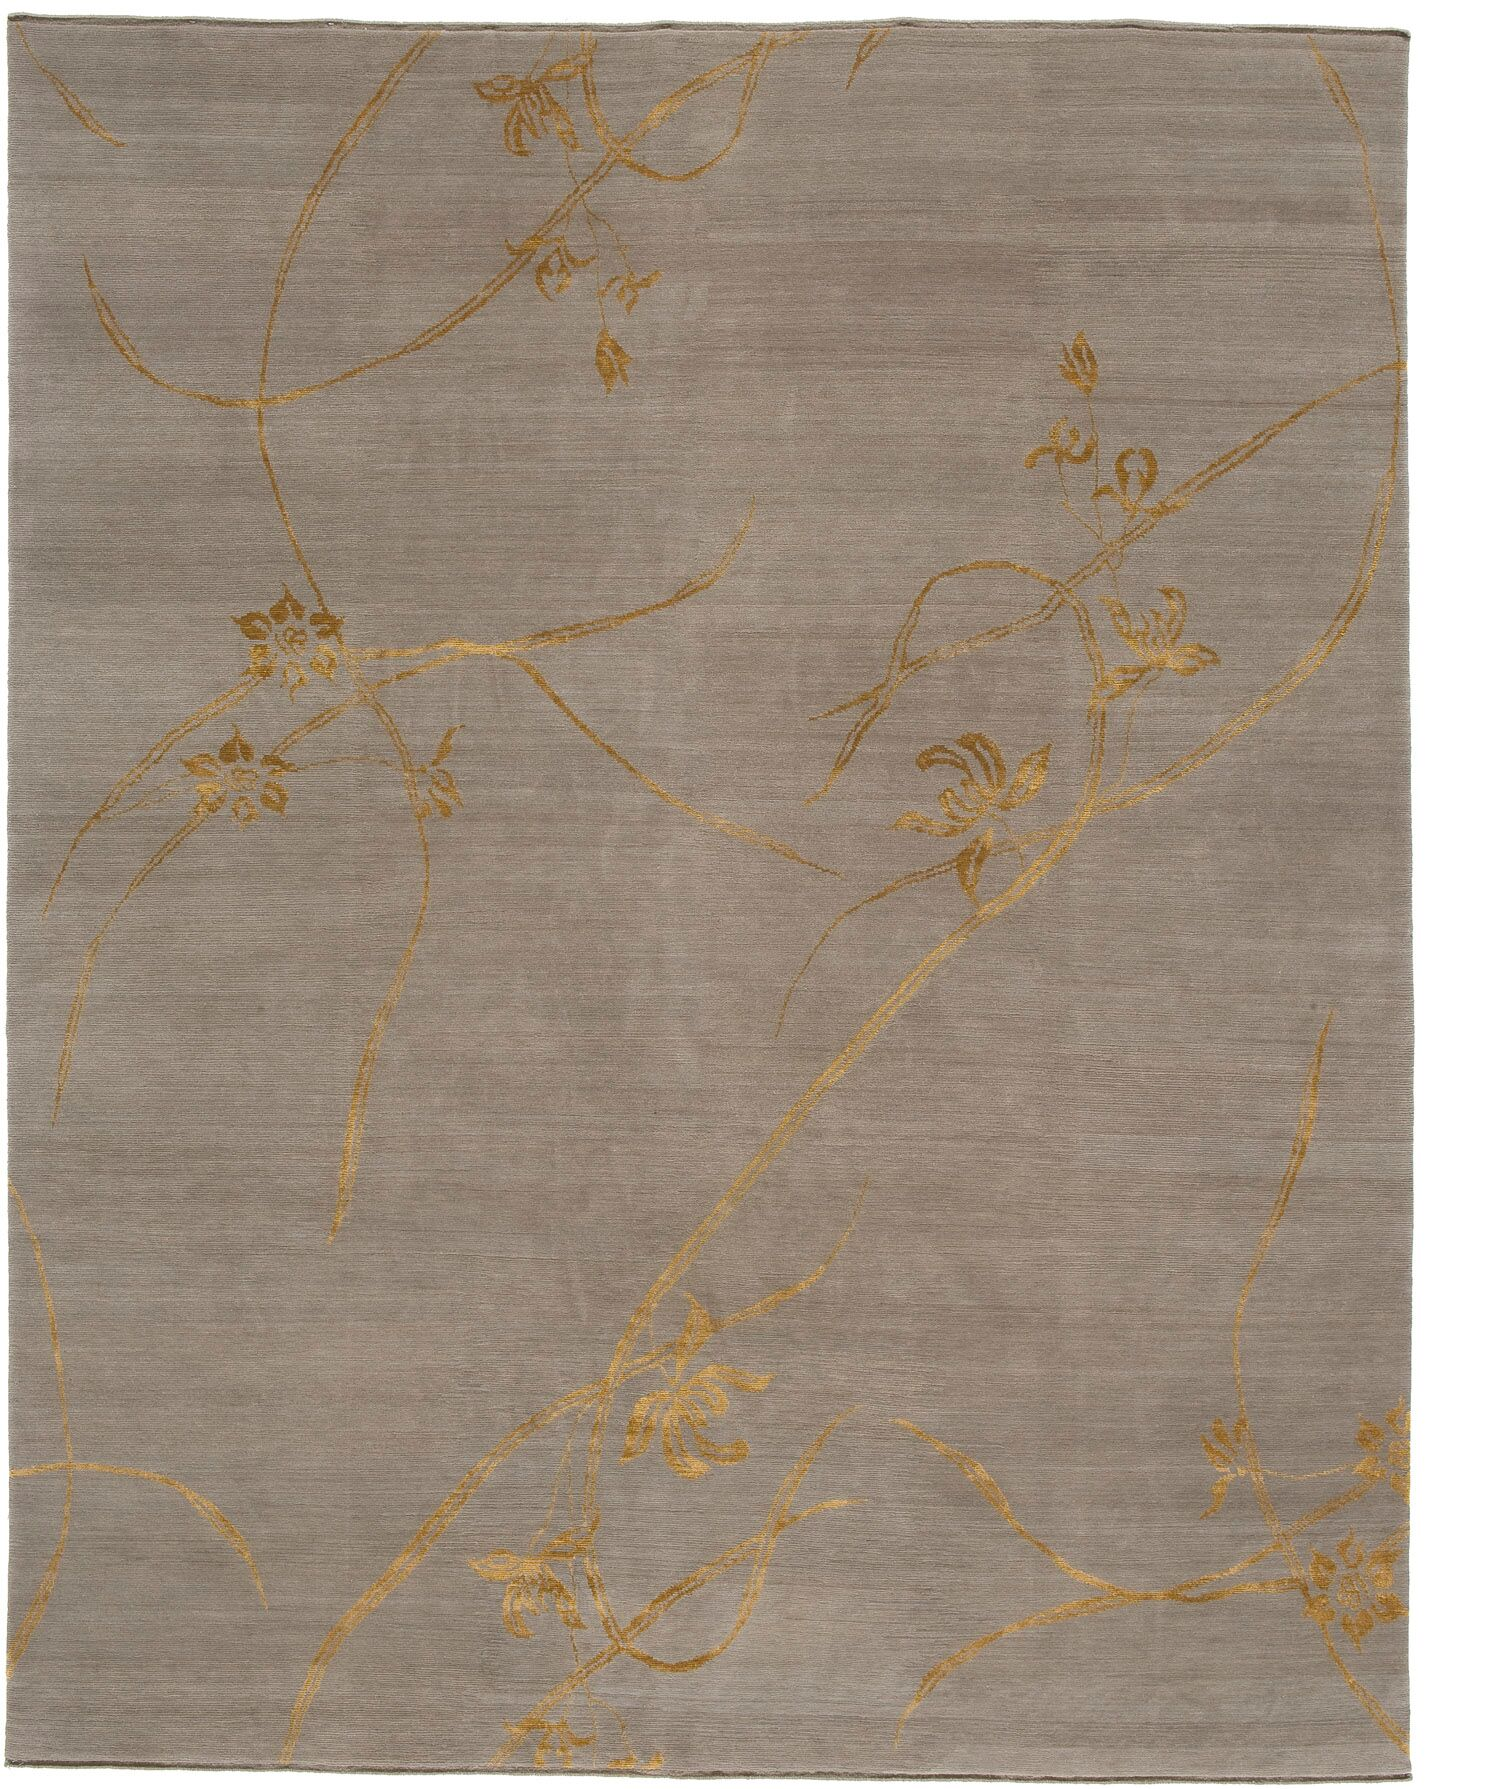 Yardo, Kimono Ribbon II, 3U14_preview.jpeg